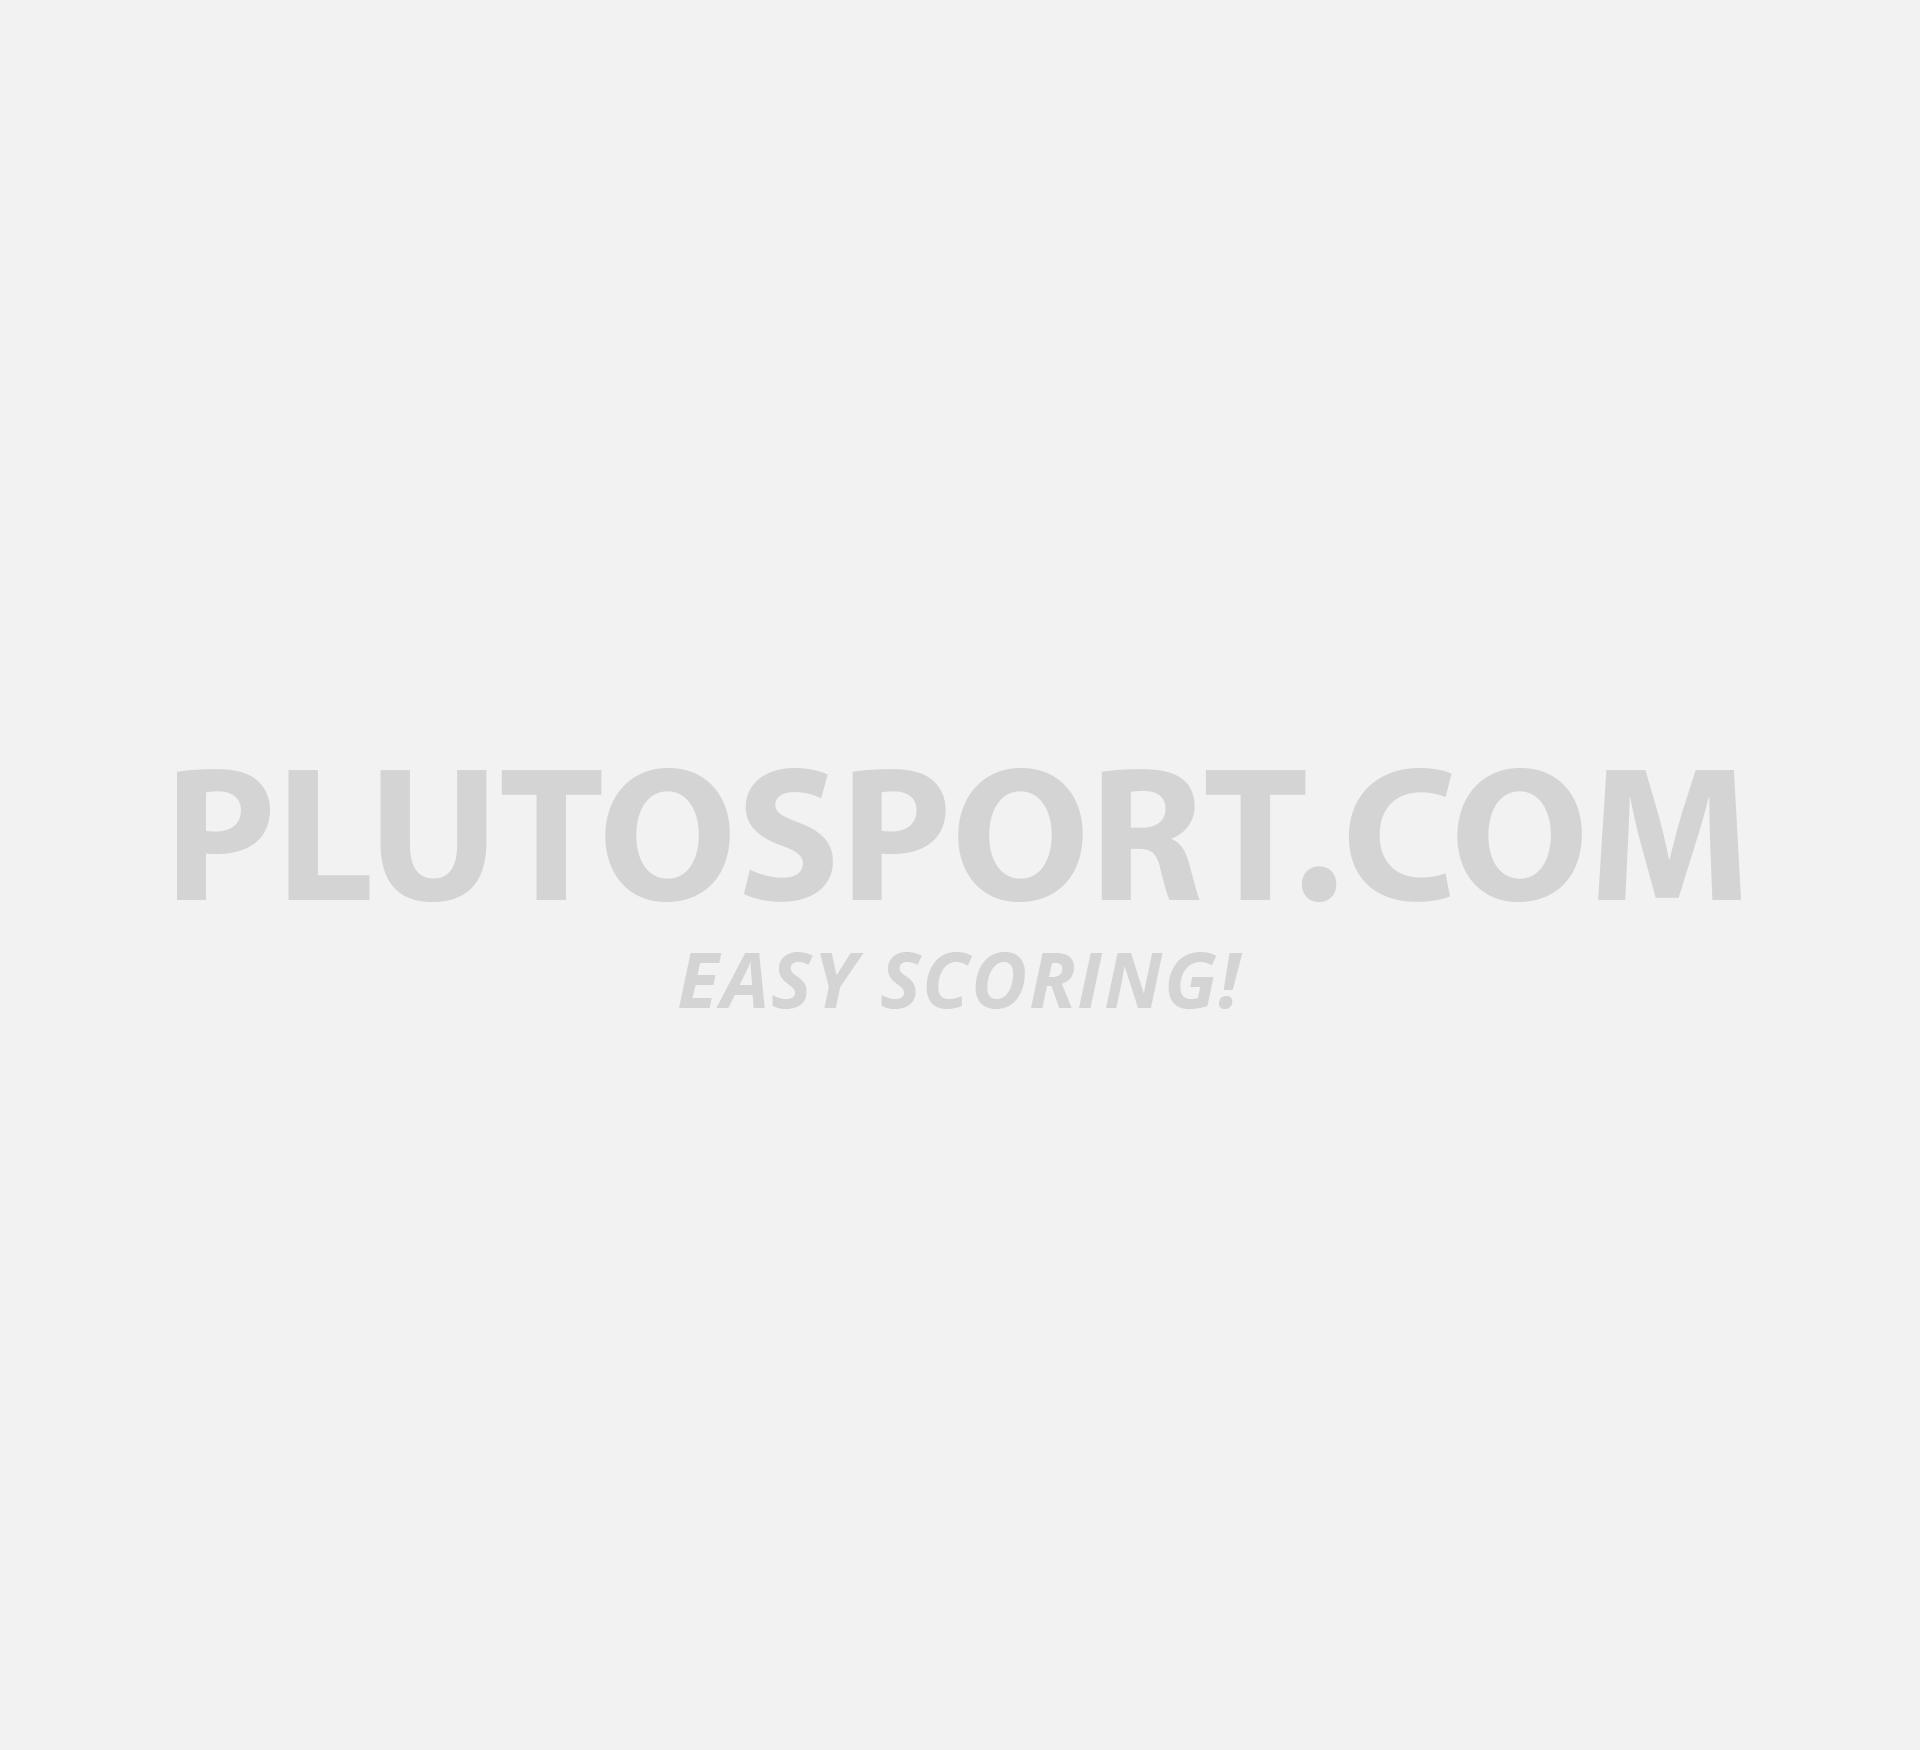 1cad8ff07a1 Crocs Isabella Sandal Ps - Aquashoes - Shoes - Watersport - Sports ...